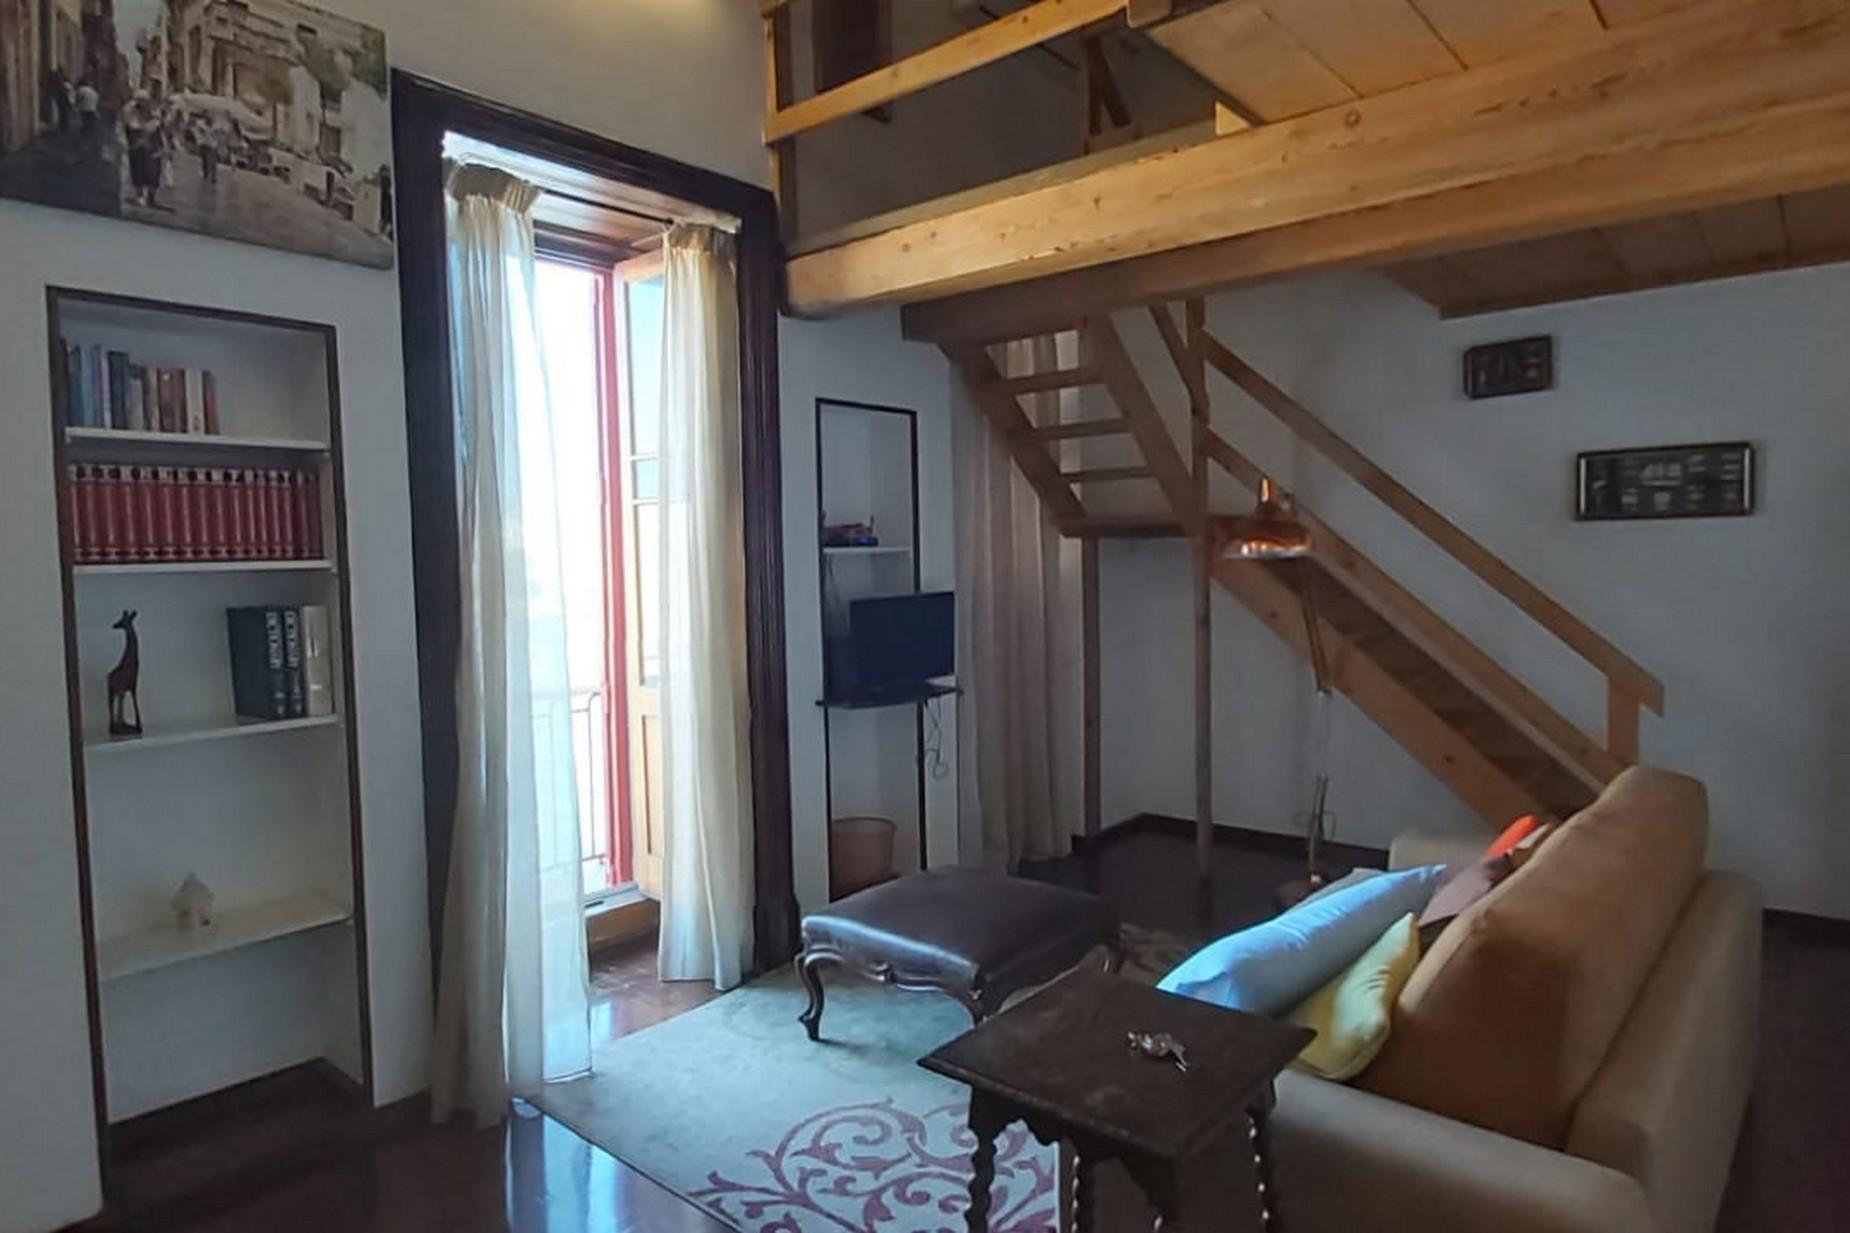 4 bed  For Sale in Valletta, Valletta - thumb 7